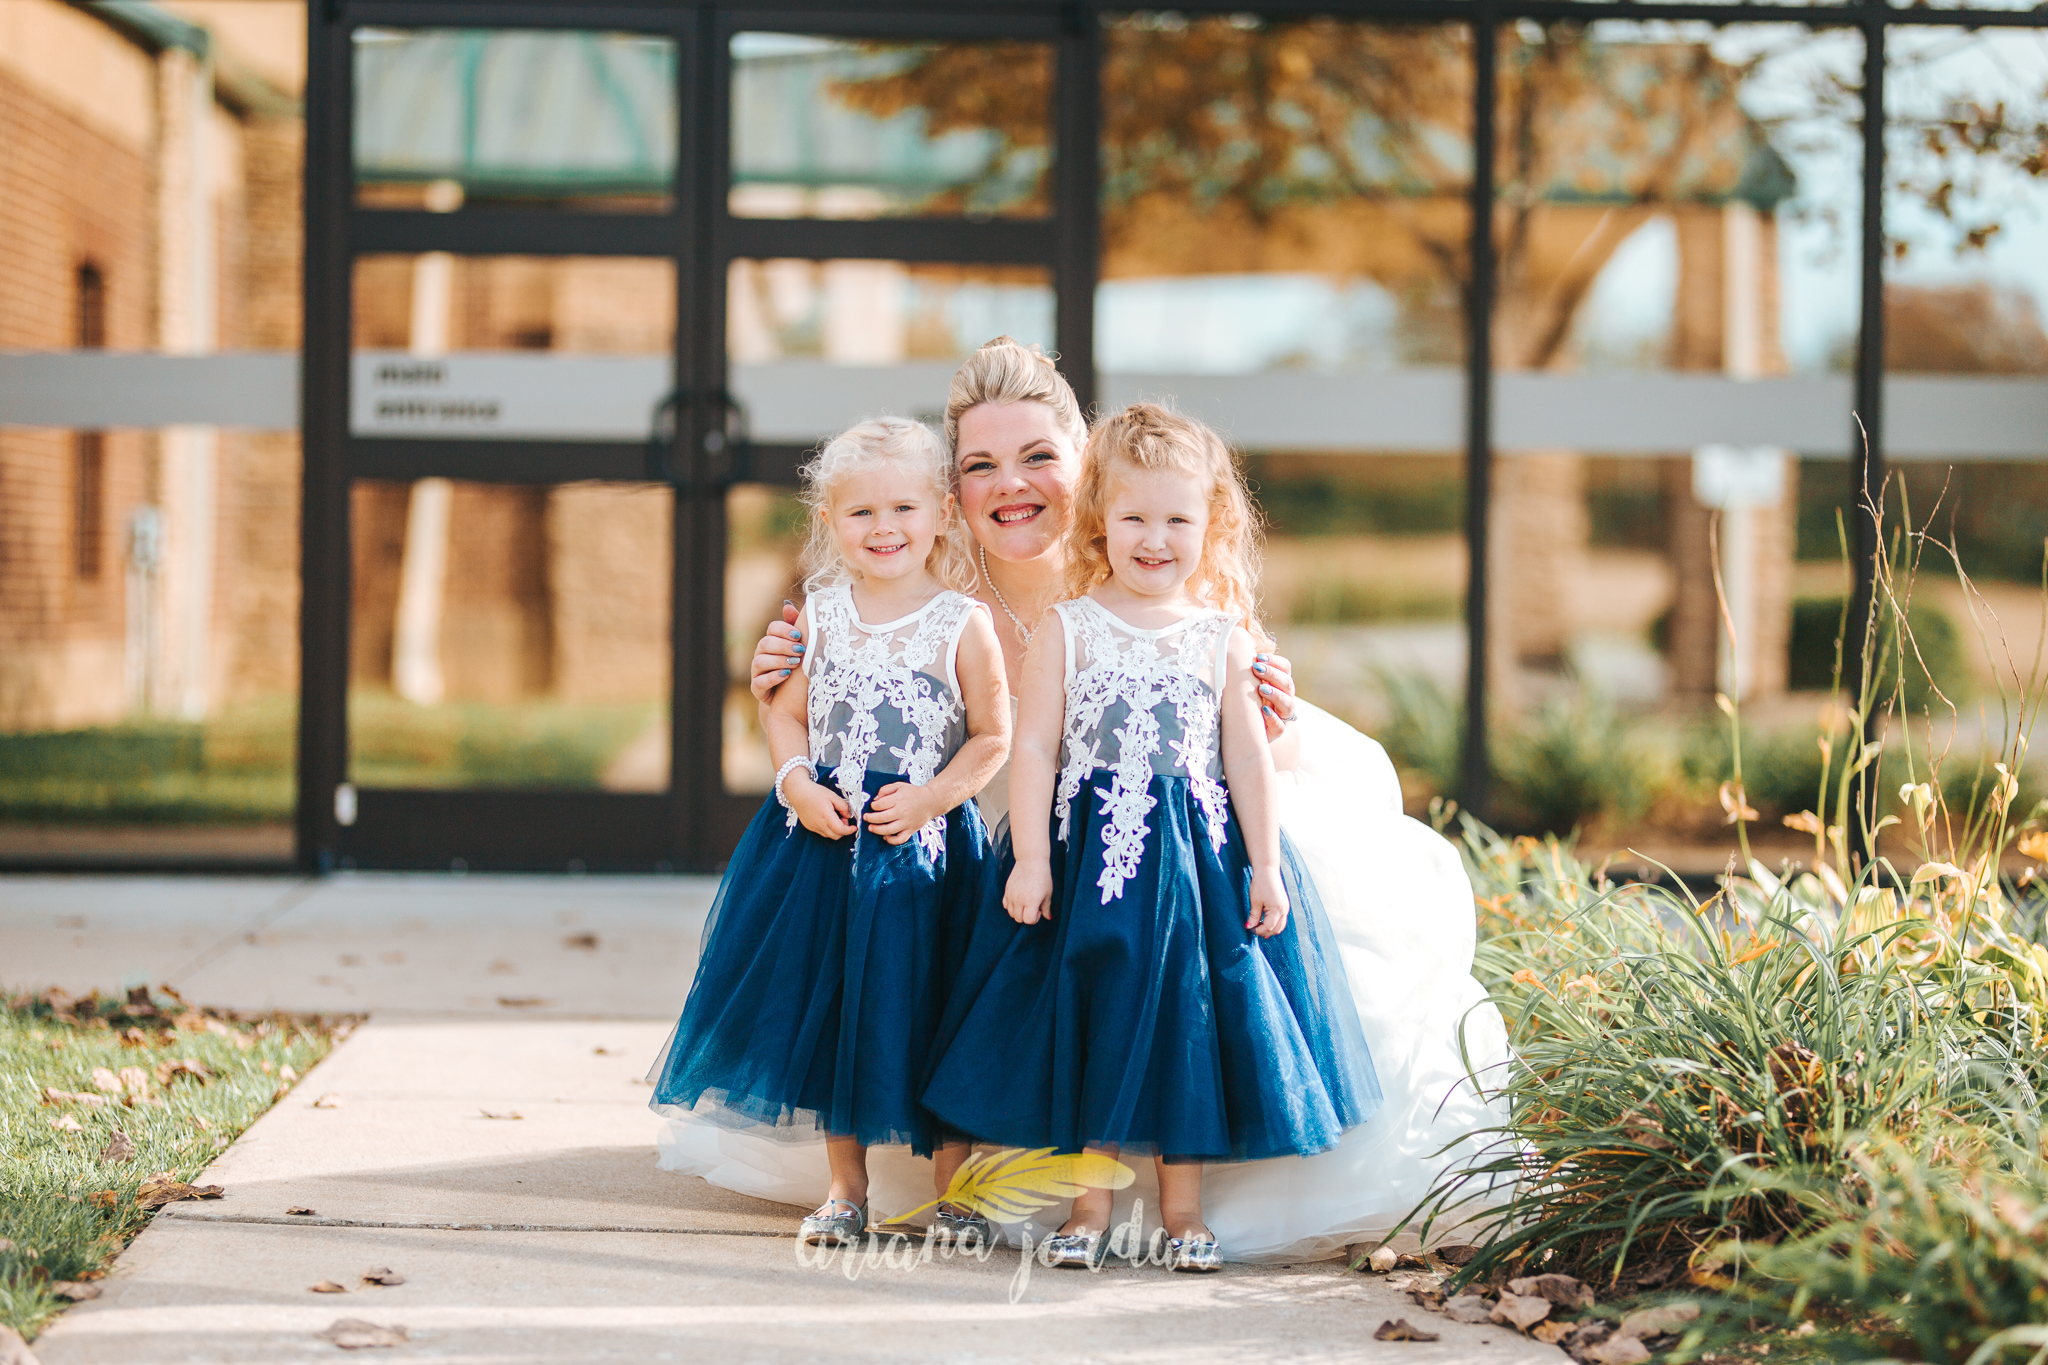 0043 Ariana Jordan Photography - Georgetown KY Wedding Photographer 6584.jpg